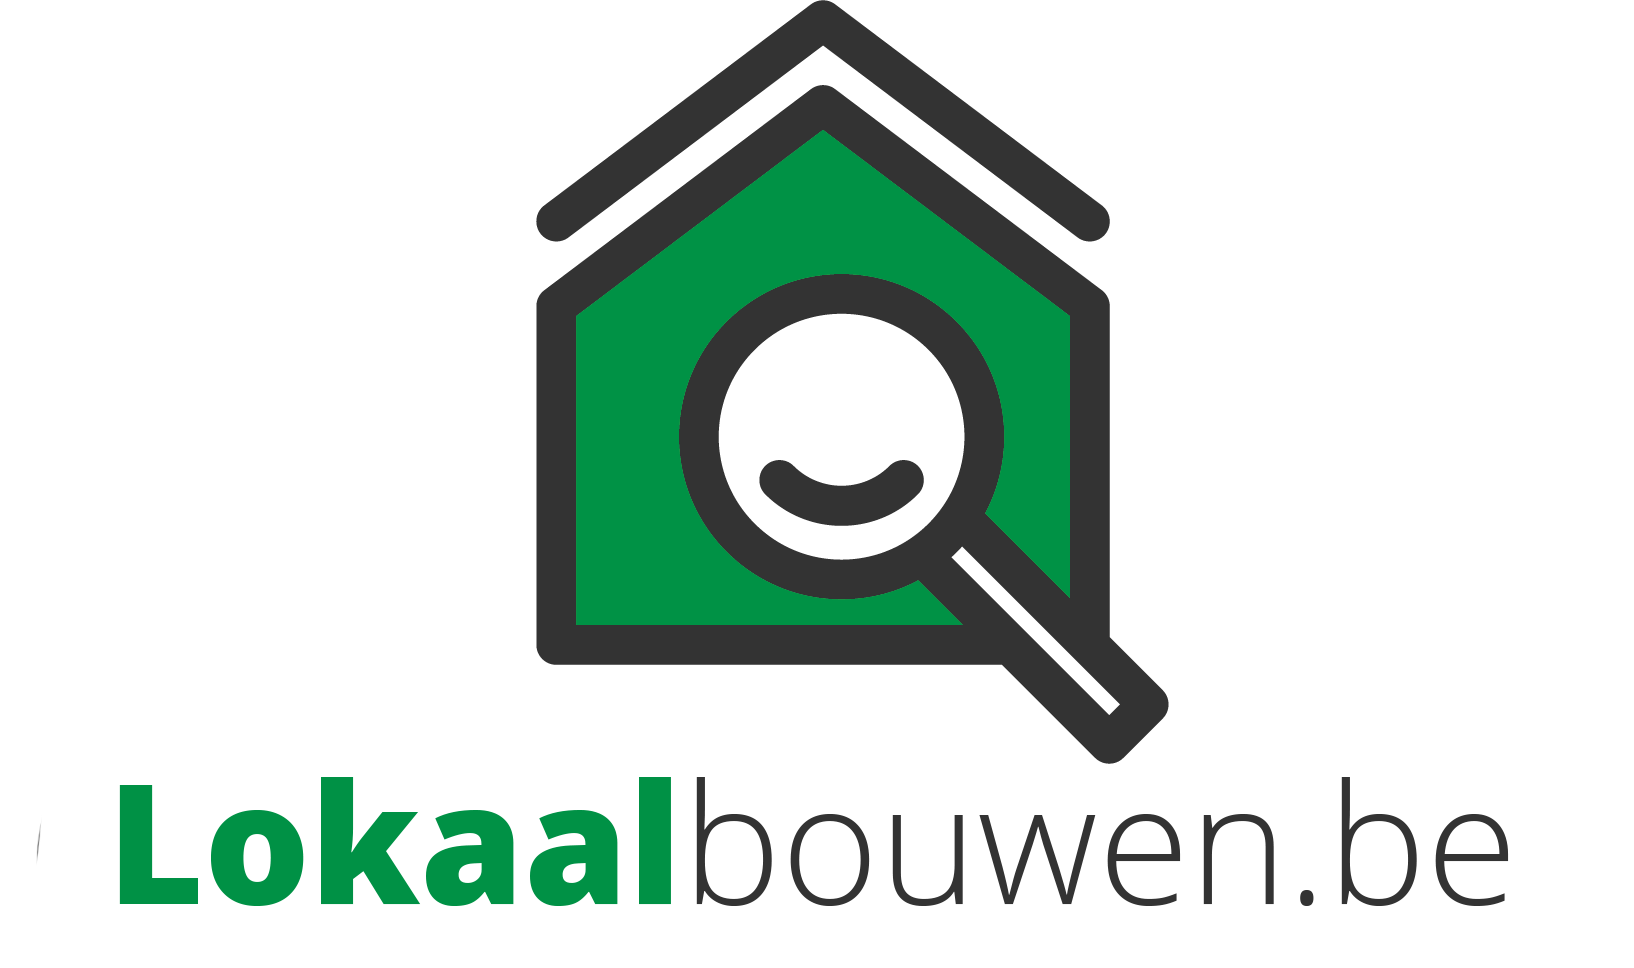 logo lokaalbouwen.be